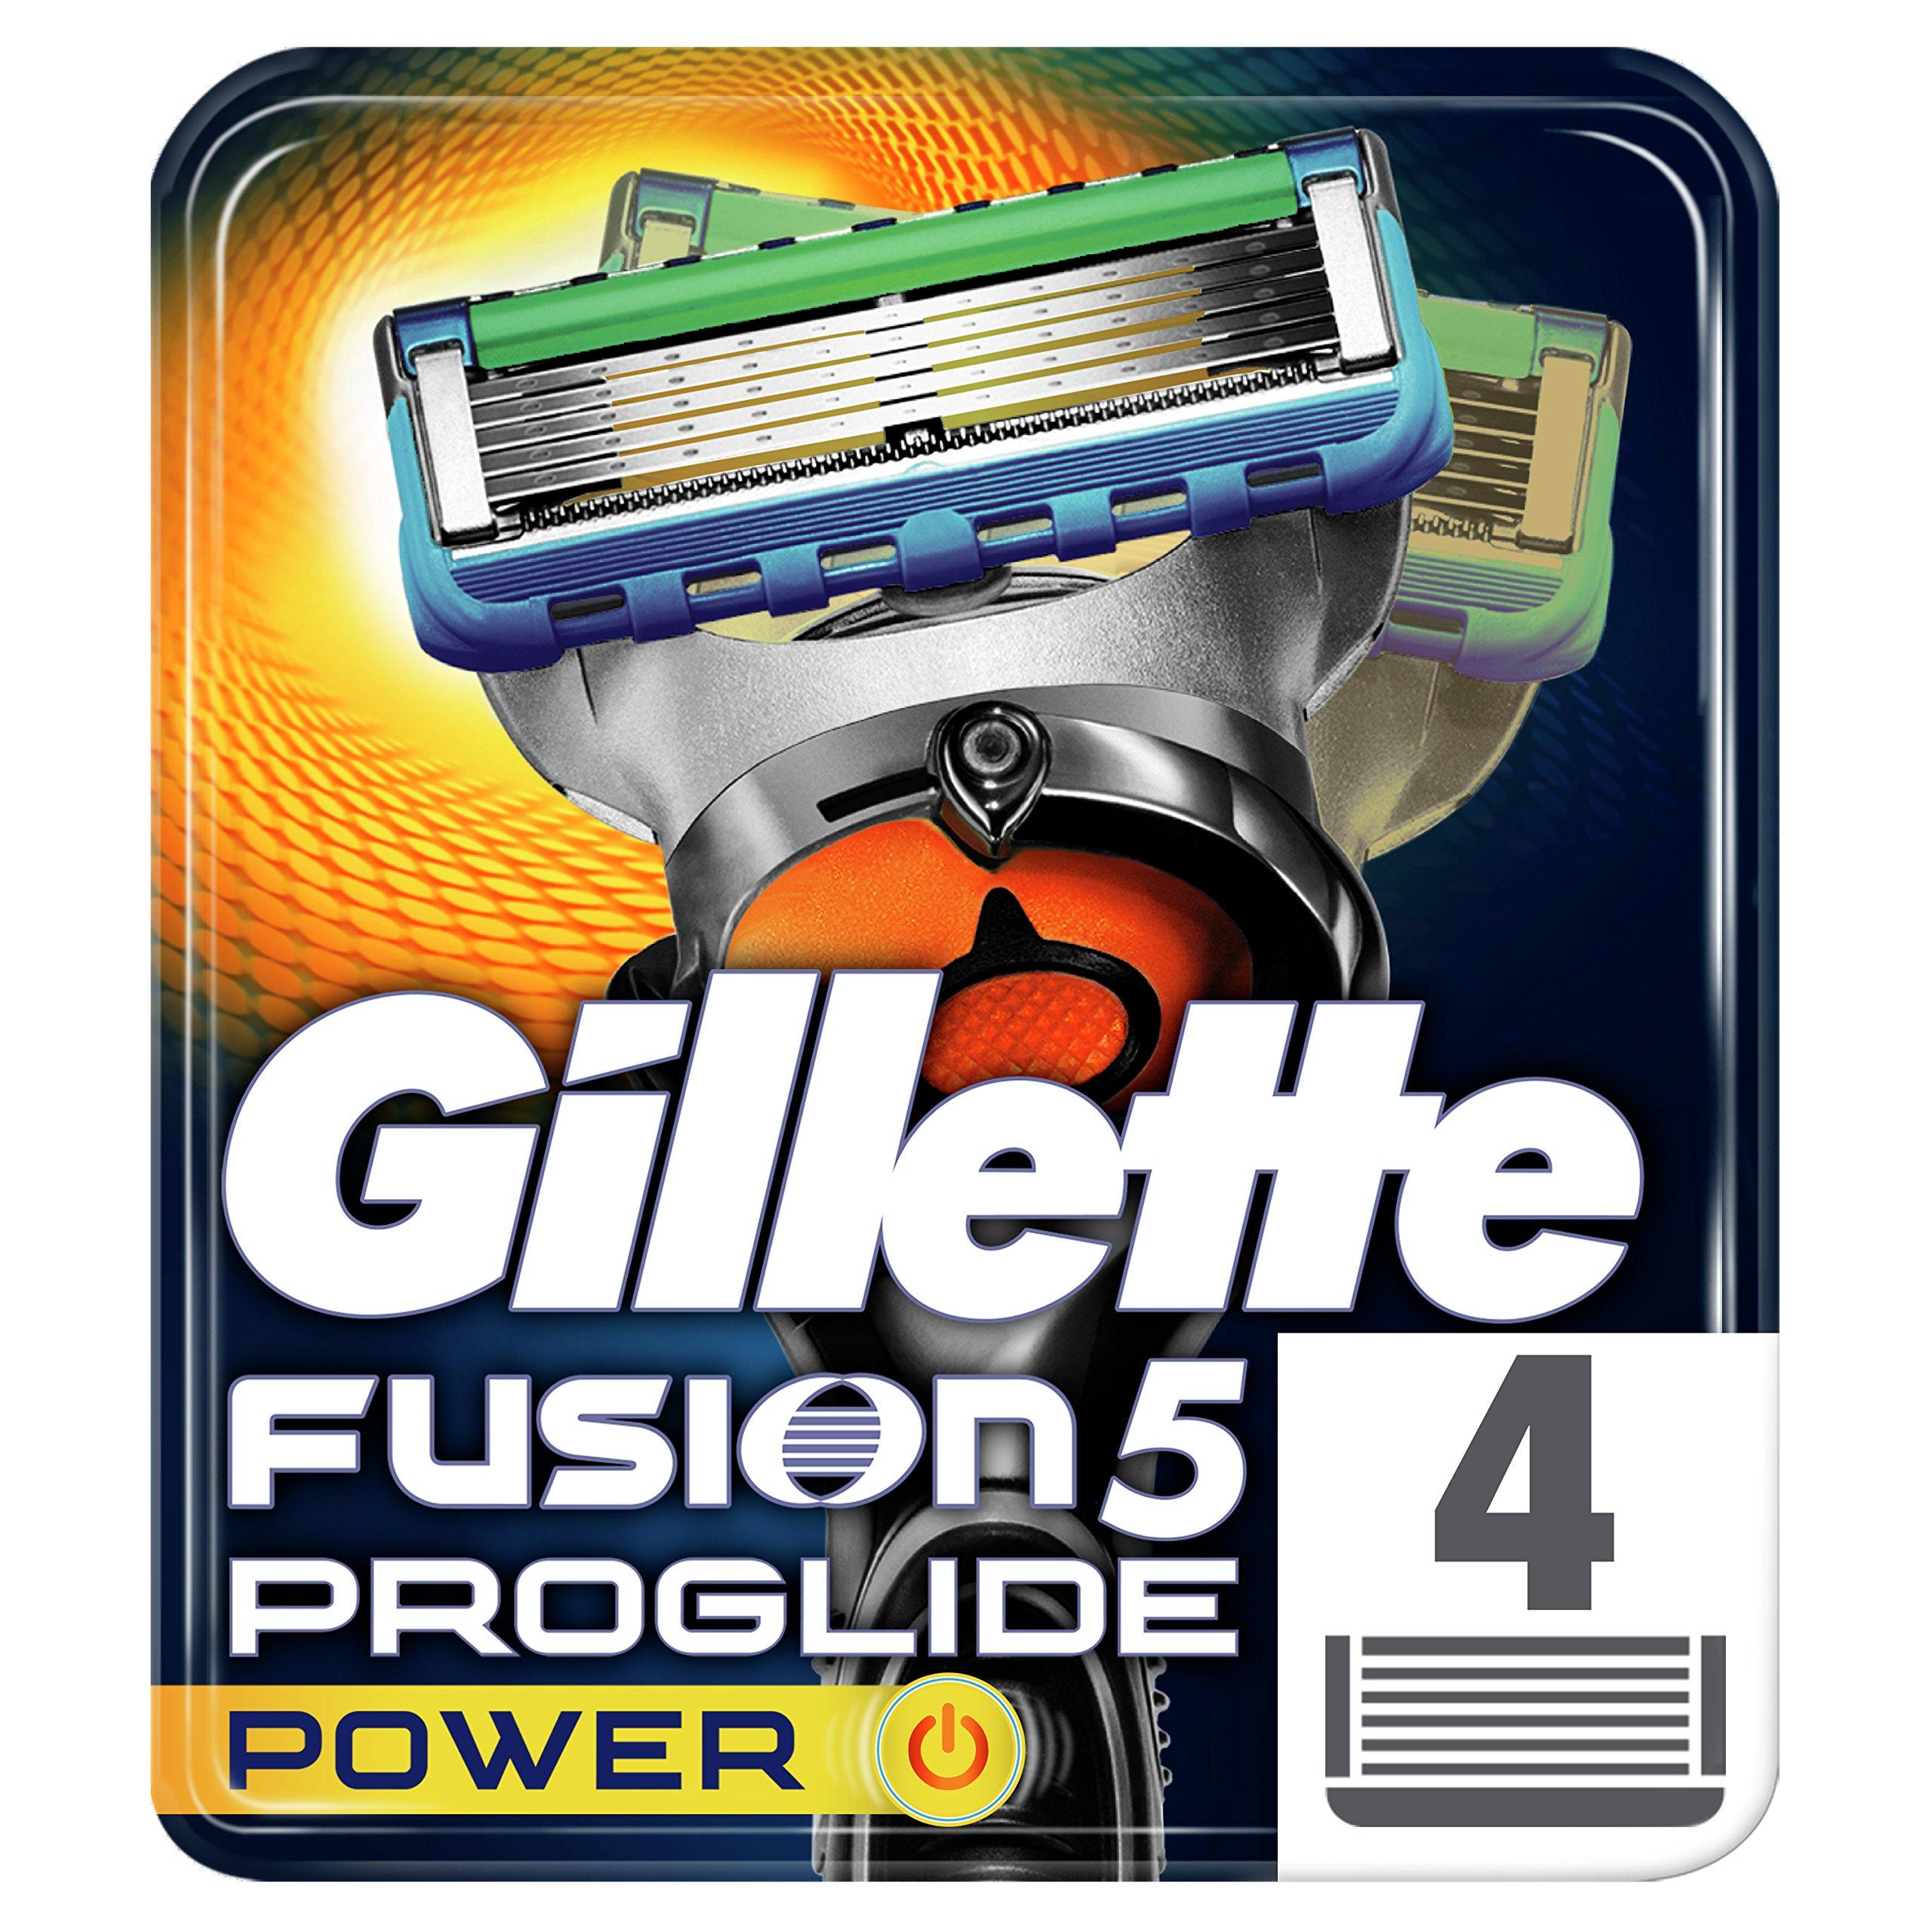 Gillette Fusion ProGlide Power Men's Razor Blades, 4 Blades product image